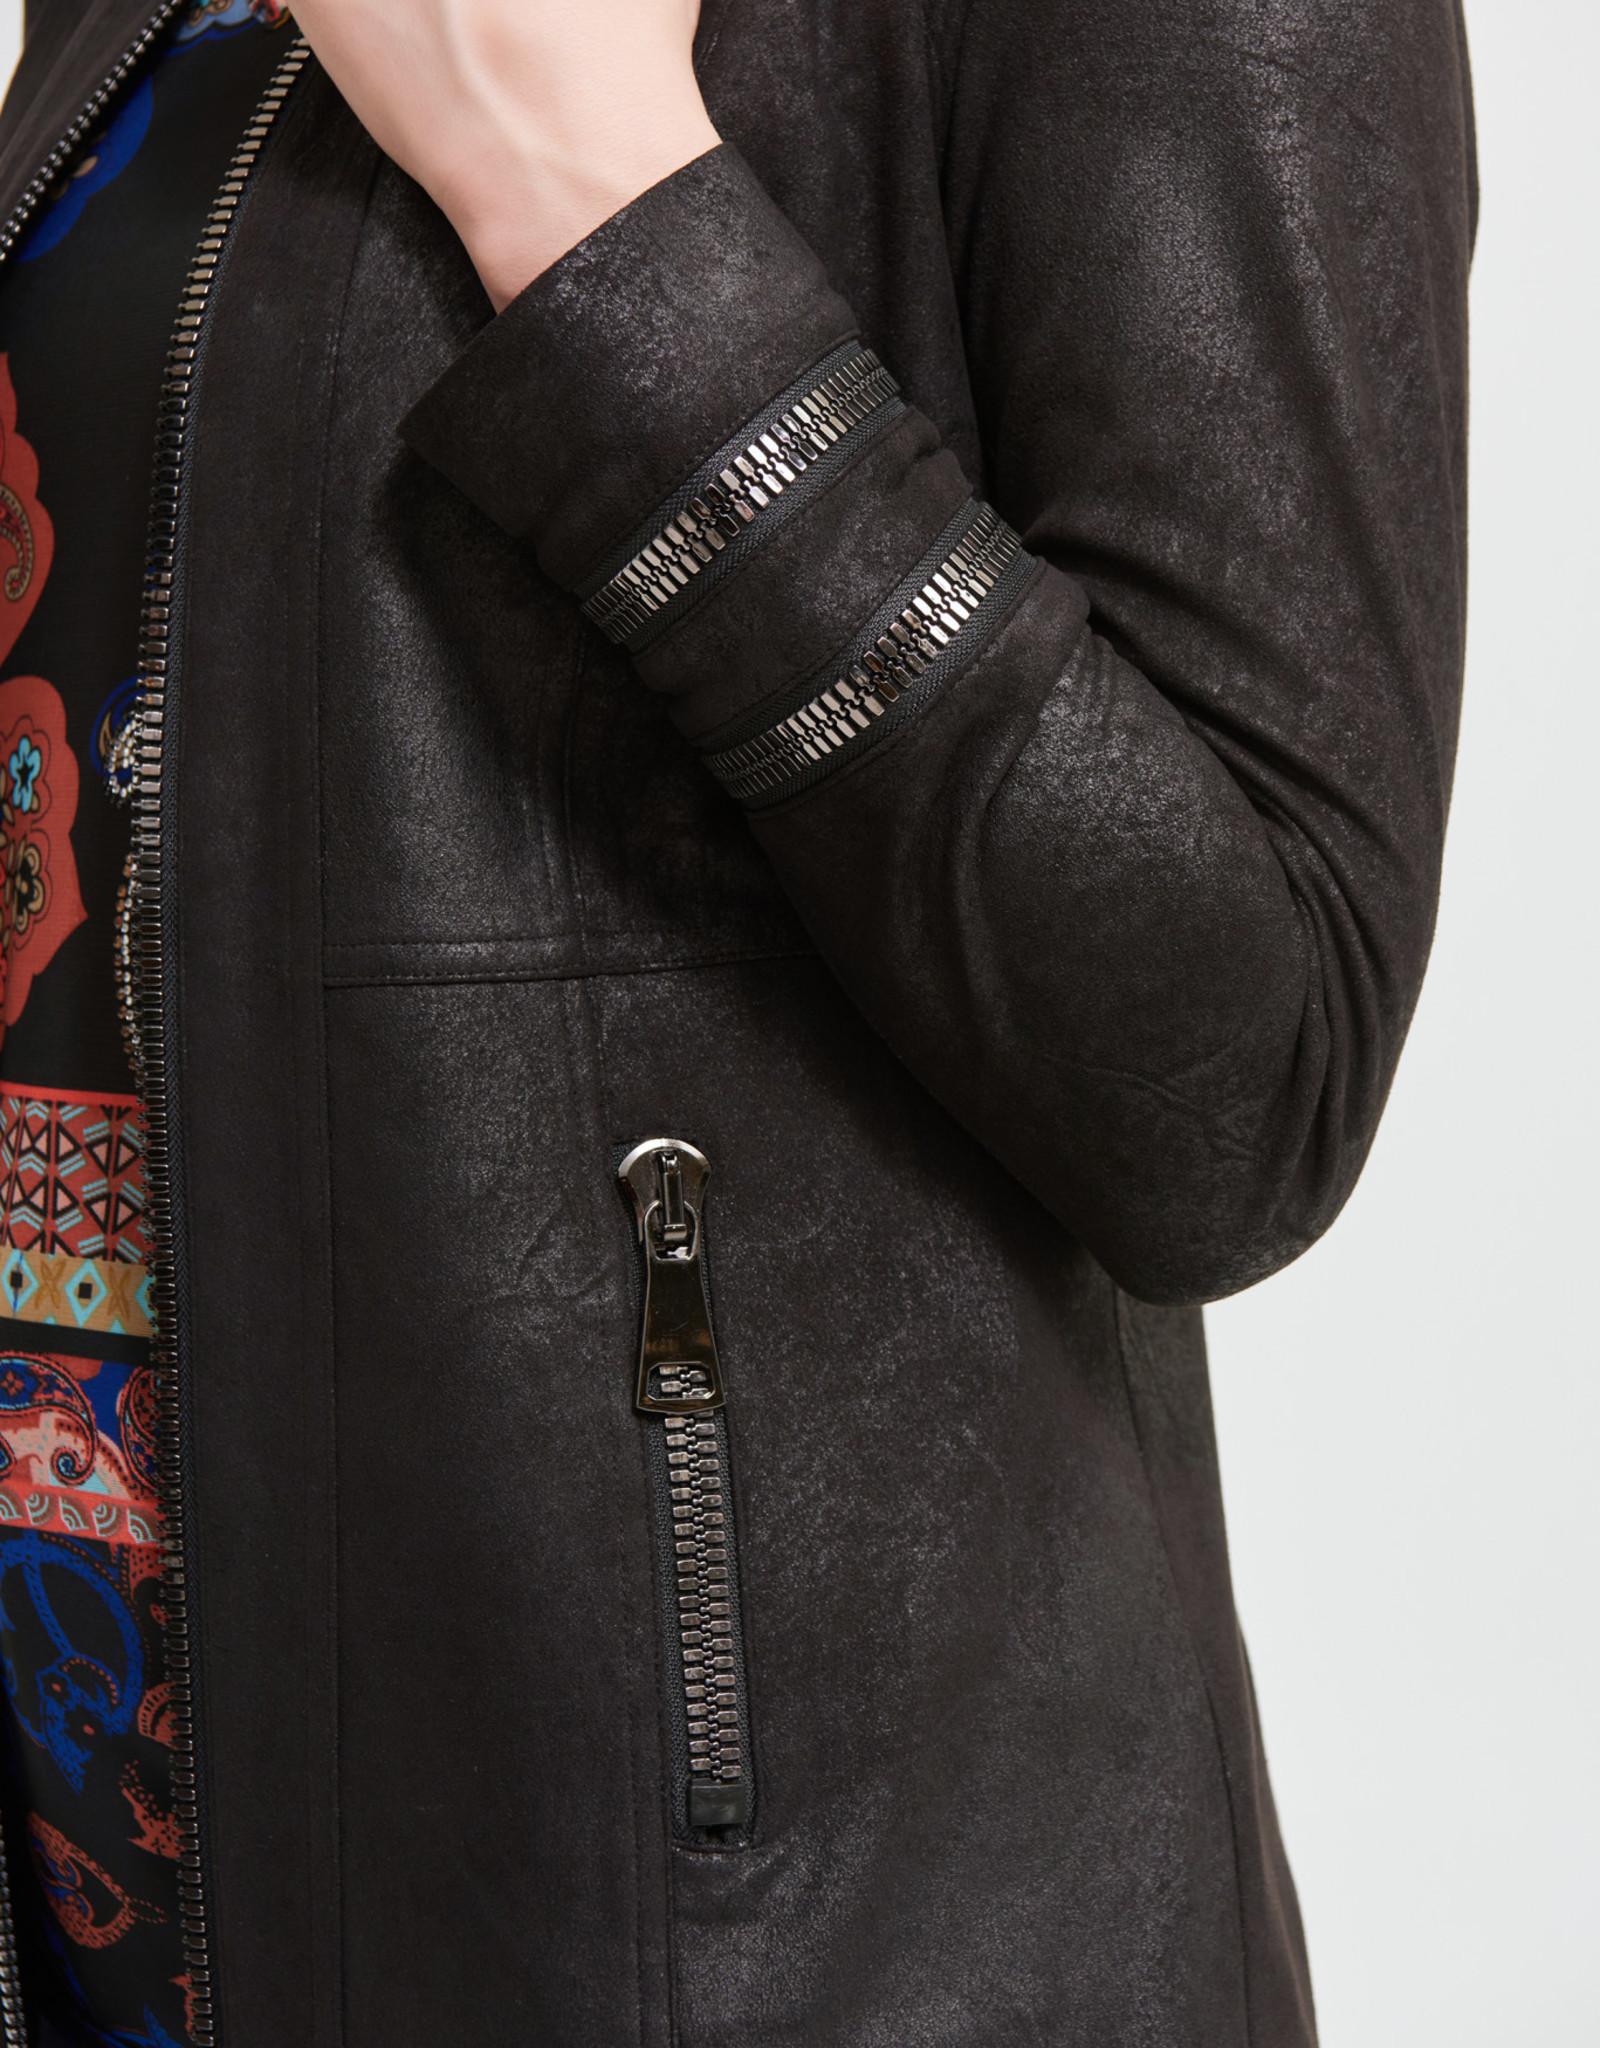 Joseph Ribkoff Black Jacket w/Zipper Details